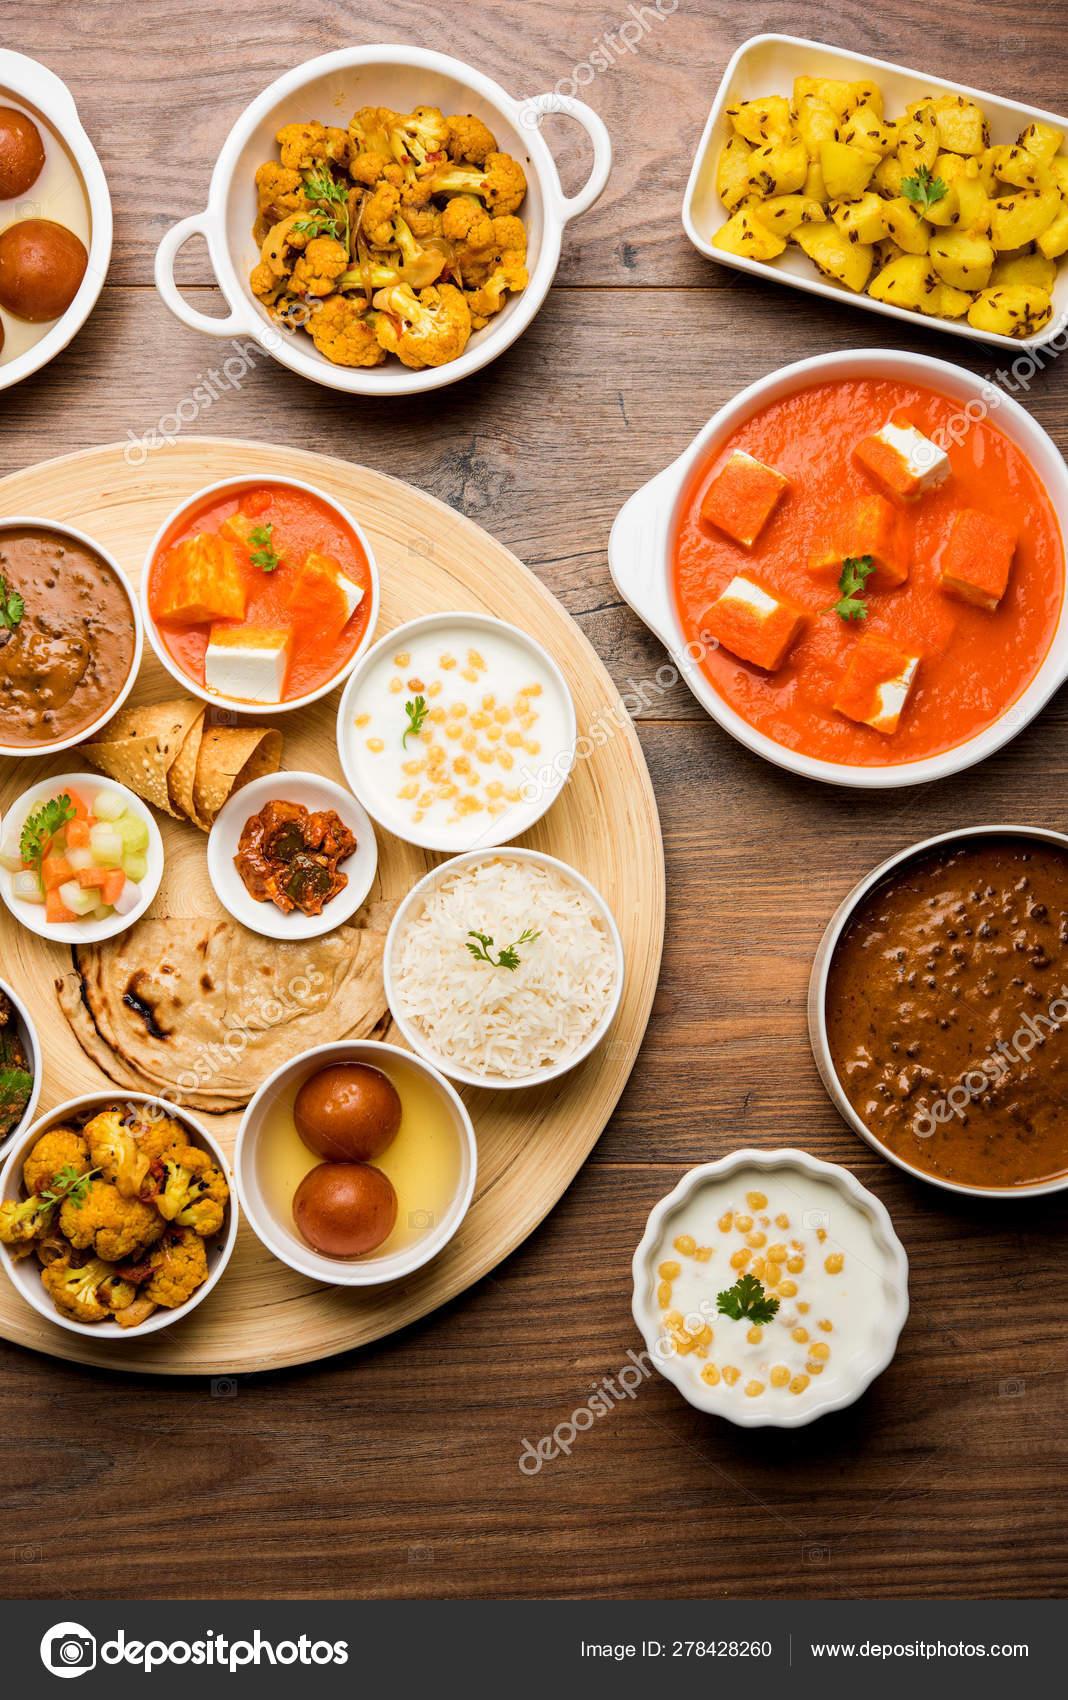 Indian Food Platter Hindu Veg Thali Selective Focus Stock Photo Image By C Arundhati Callistainteriors In 278428260